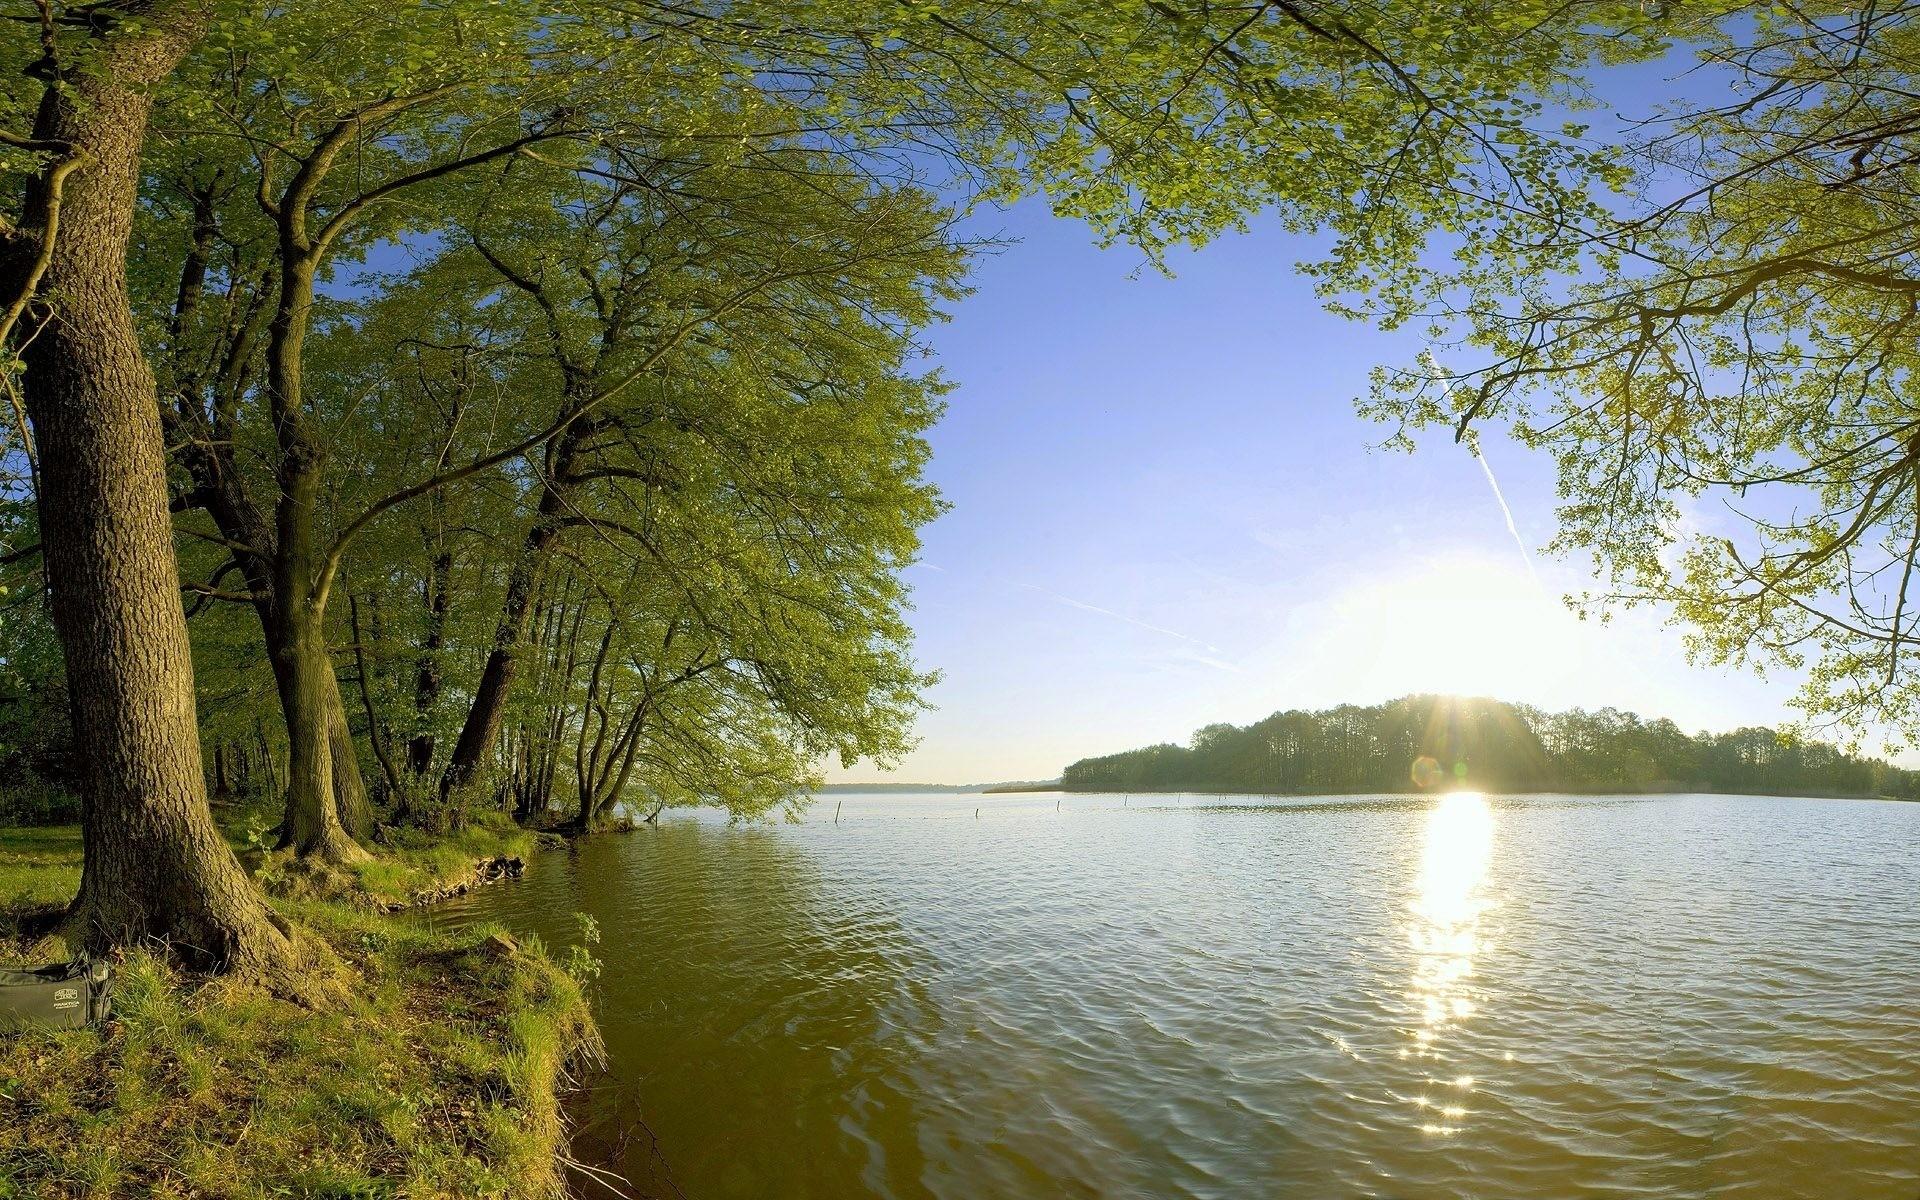 солнце берег реки картинки фото вас есть навес